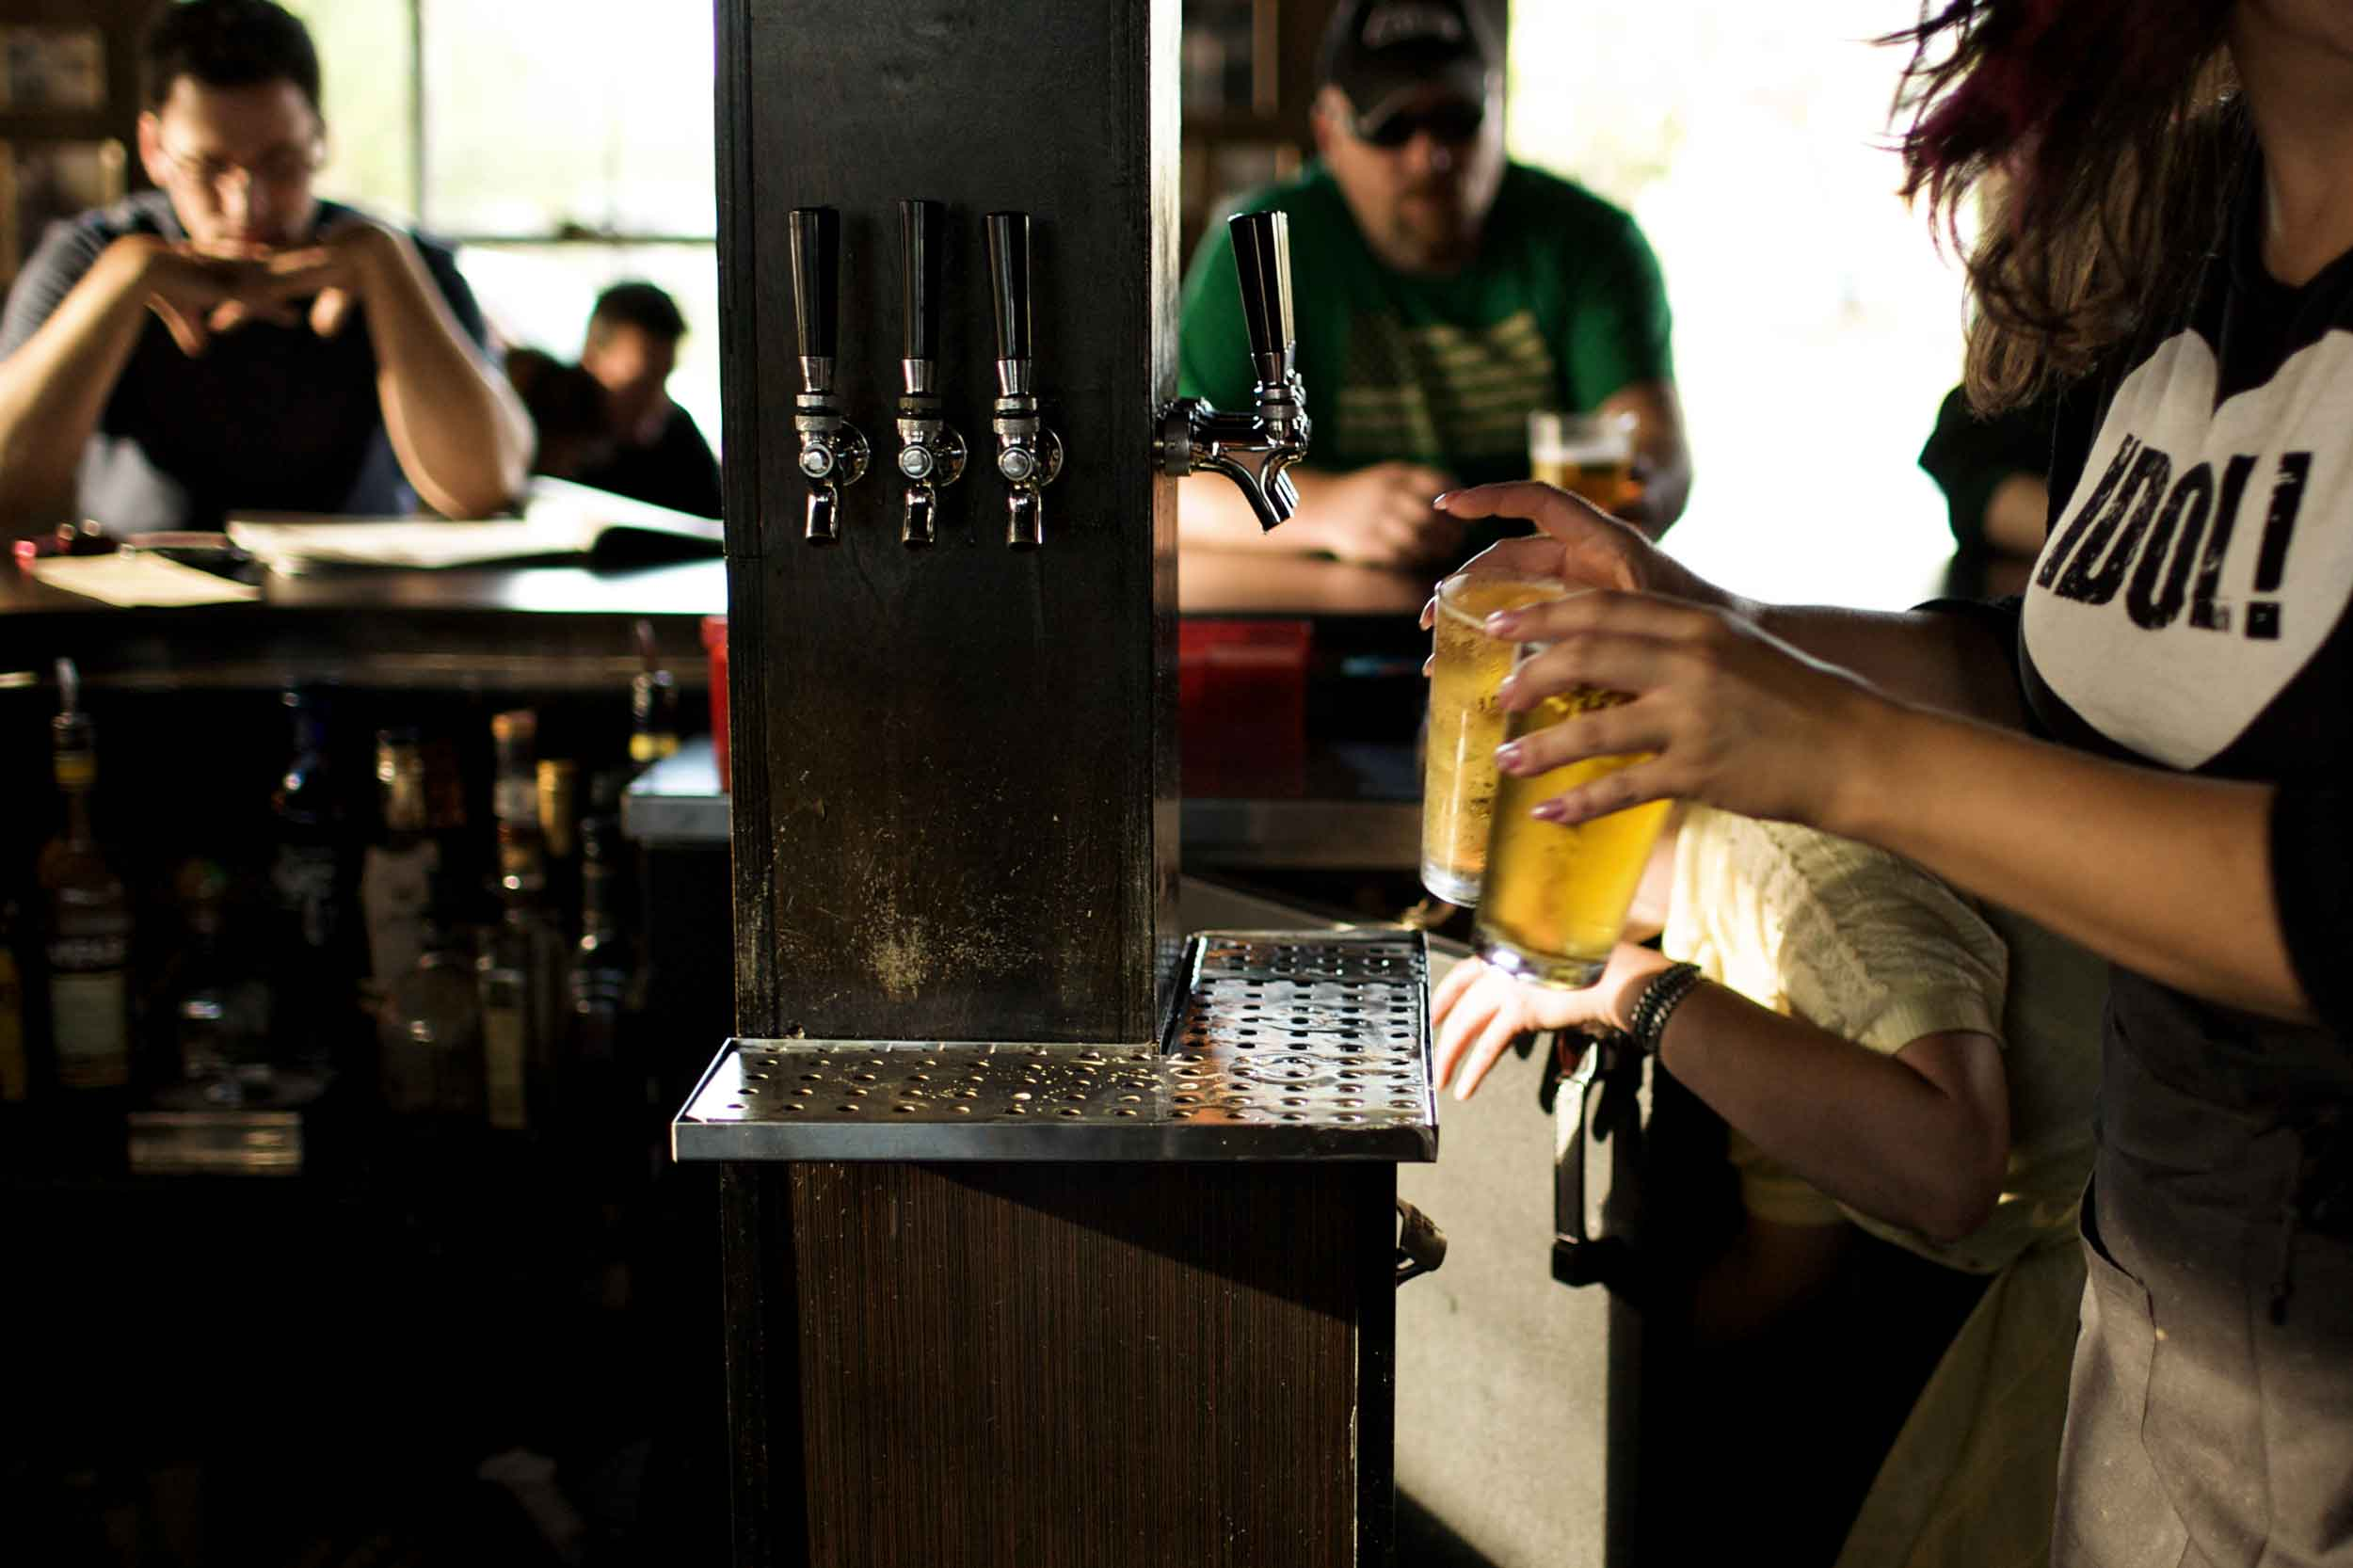 hudson-restaurant_pulling-some-beers.jpg